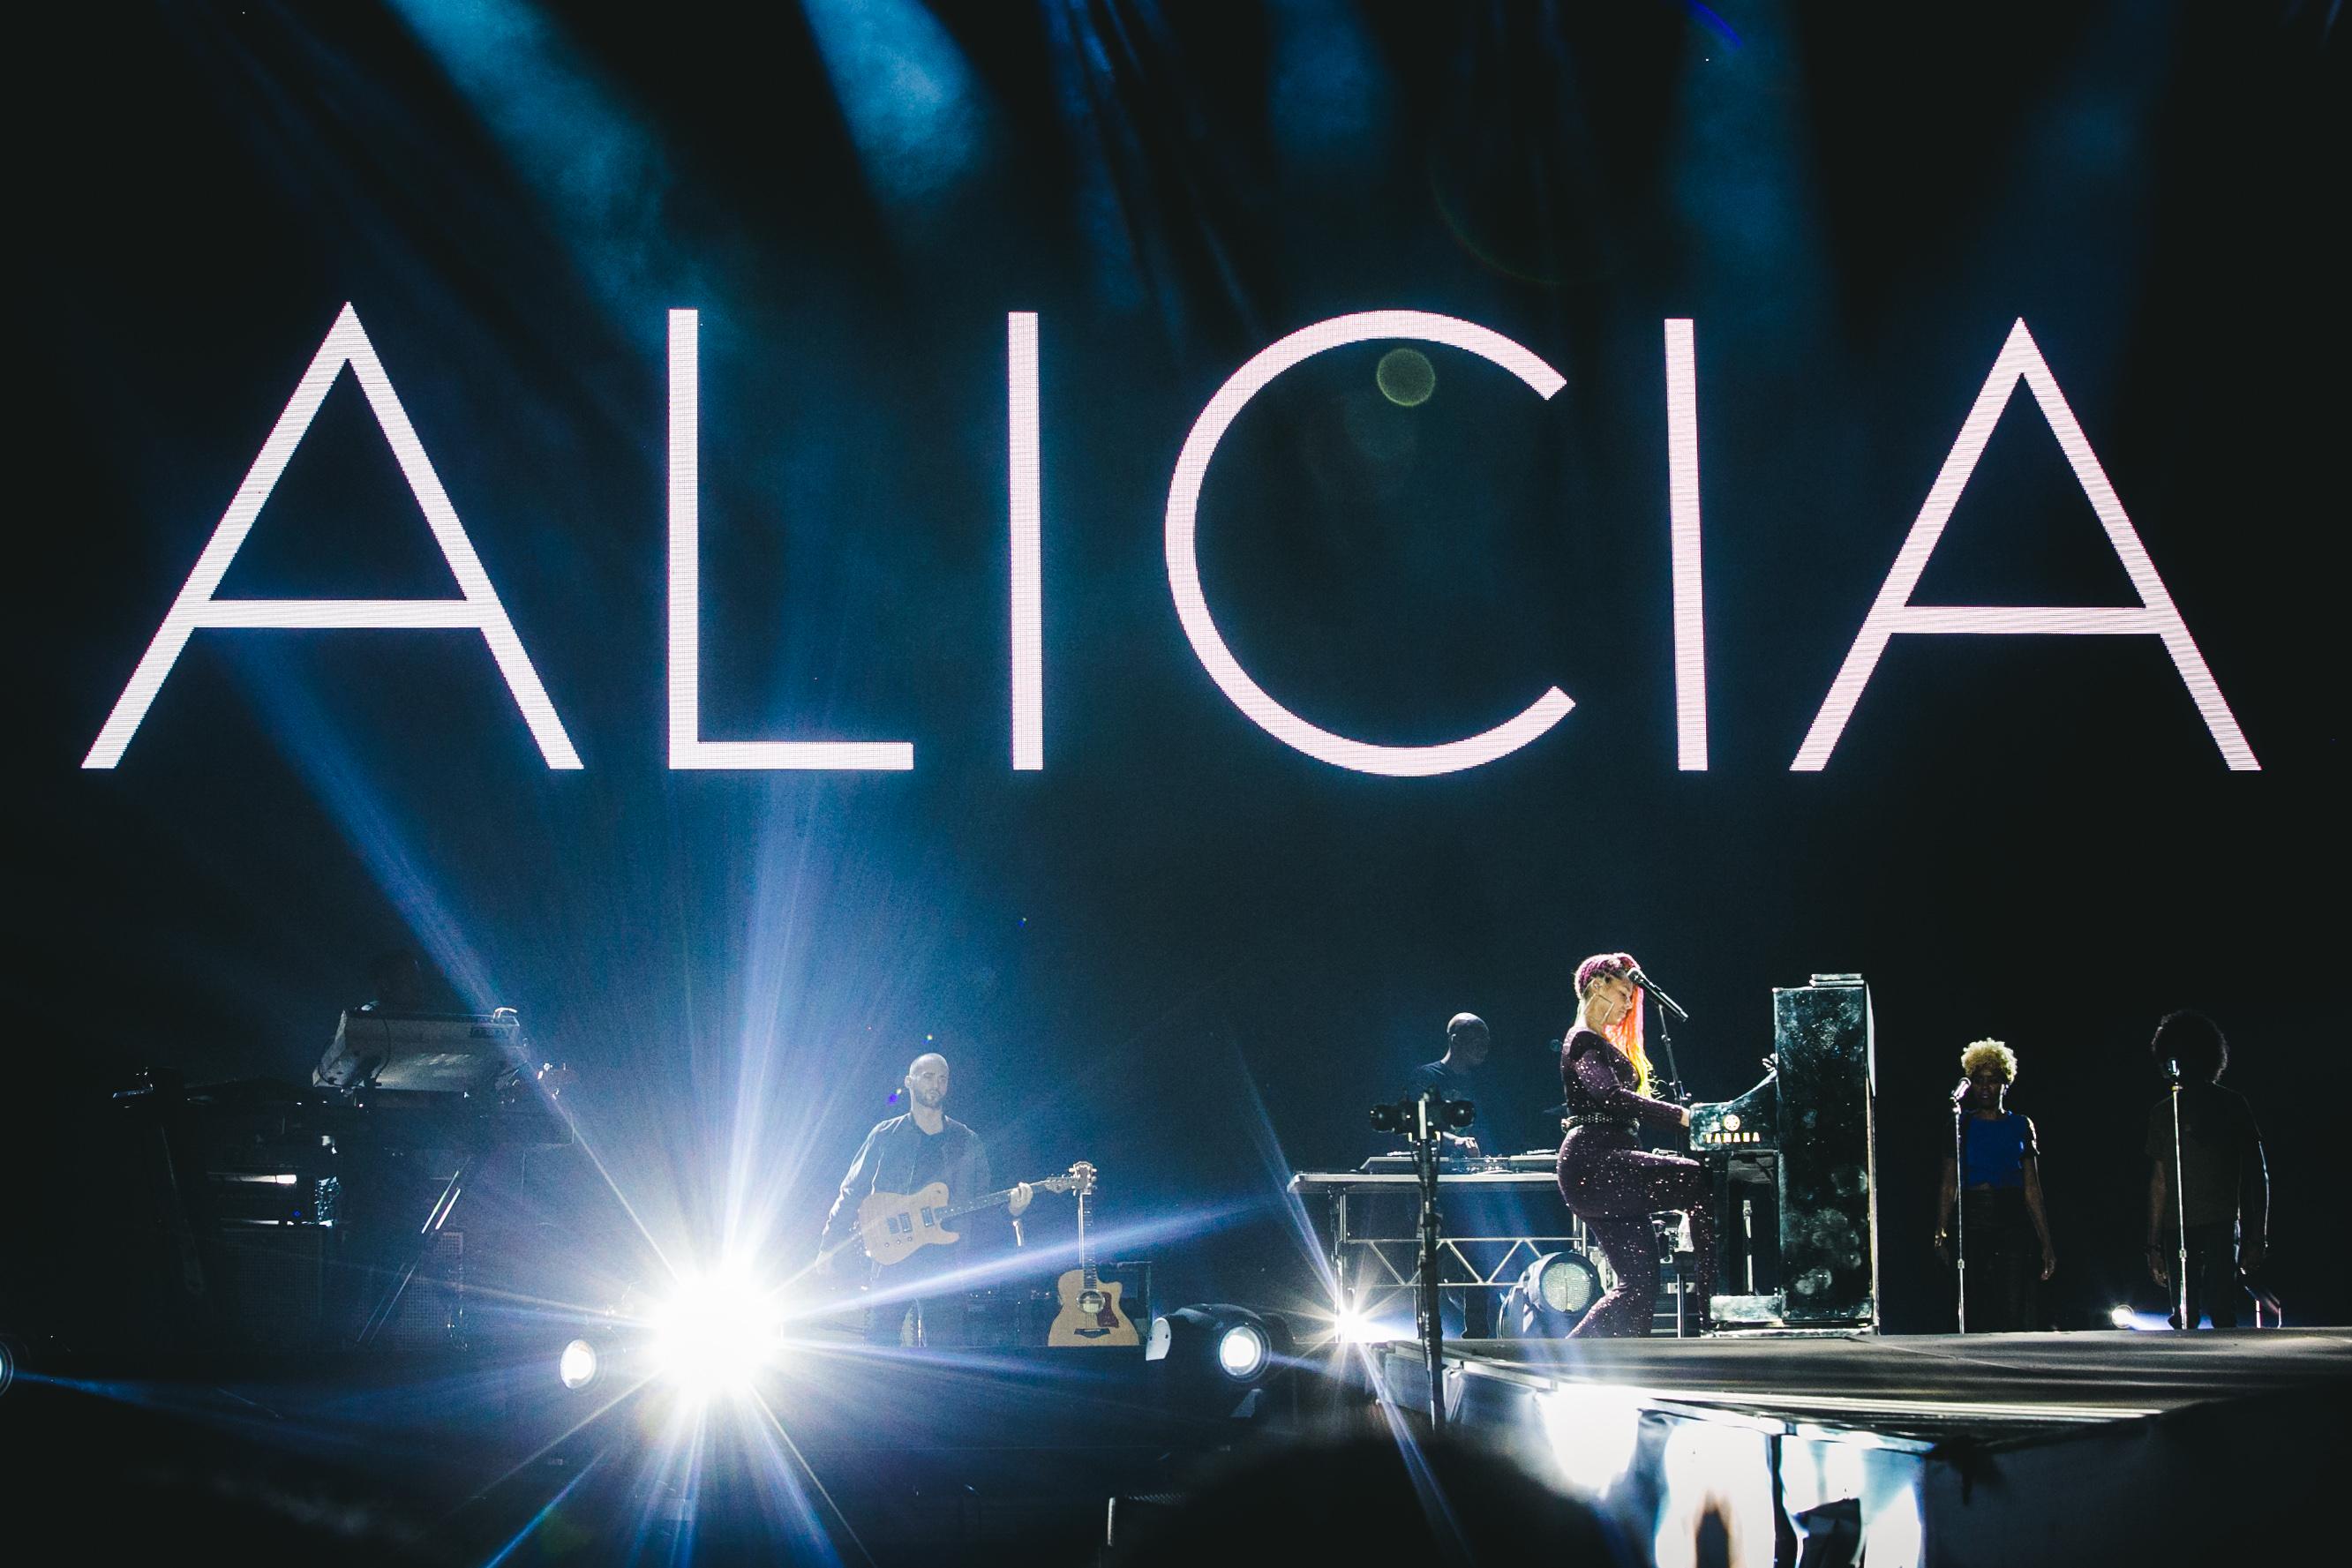 alicia-keys-rock-in-rio-2017